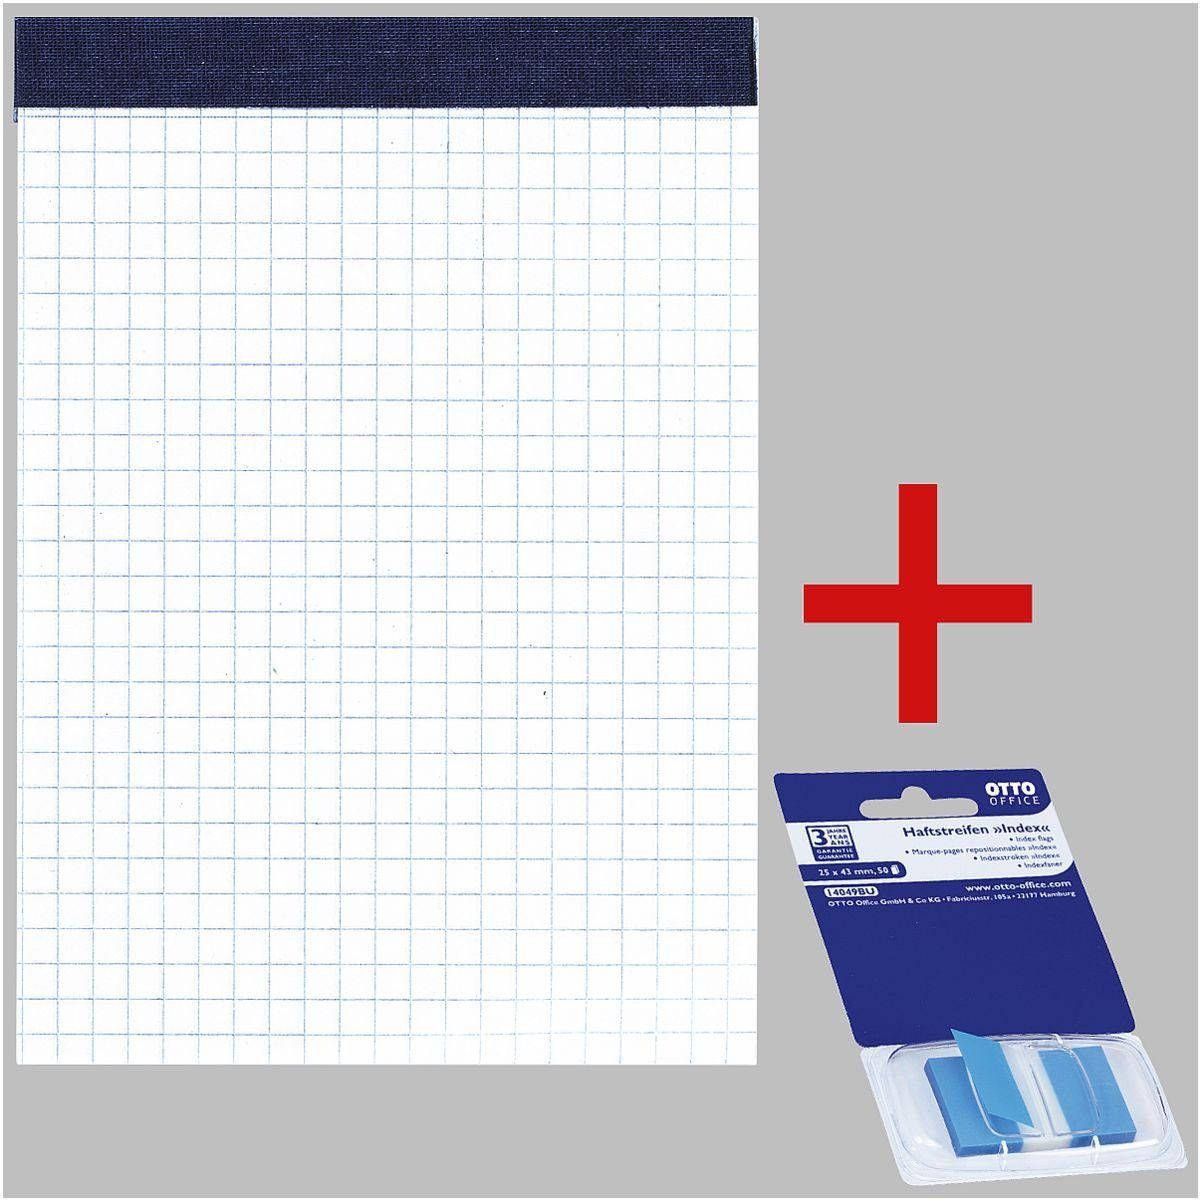 OTTO Office Standard 10er-Pack Notizblöcke inkl. Haftstreifen 1 Set